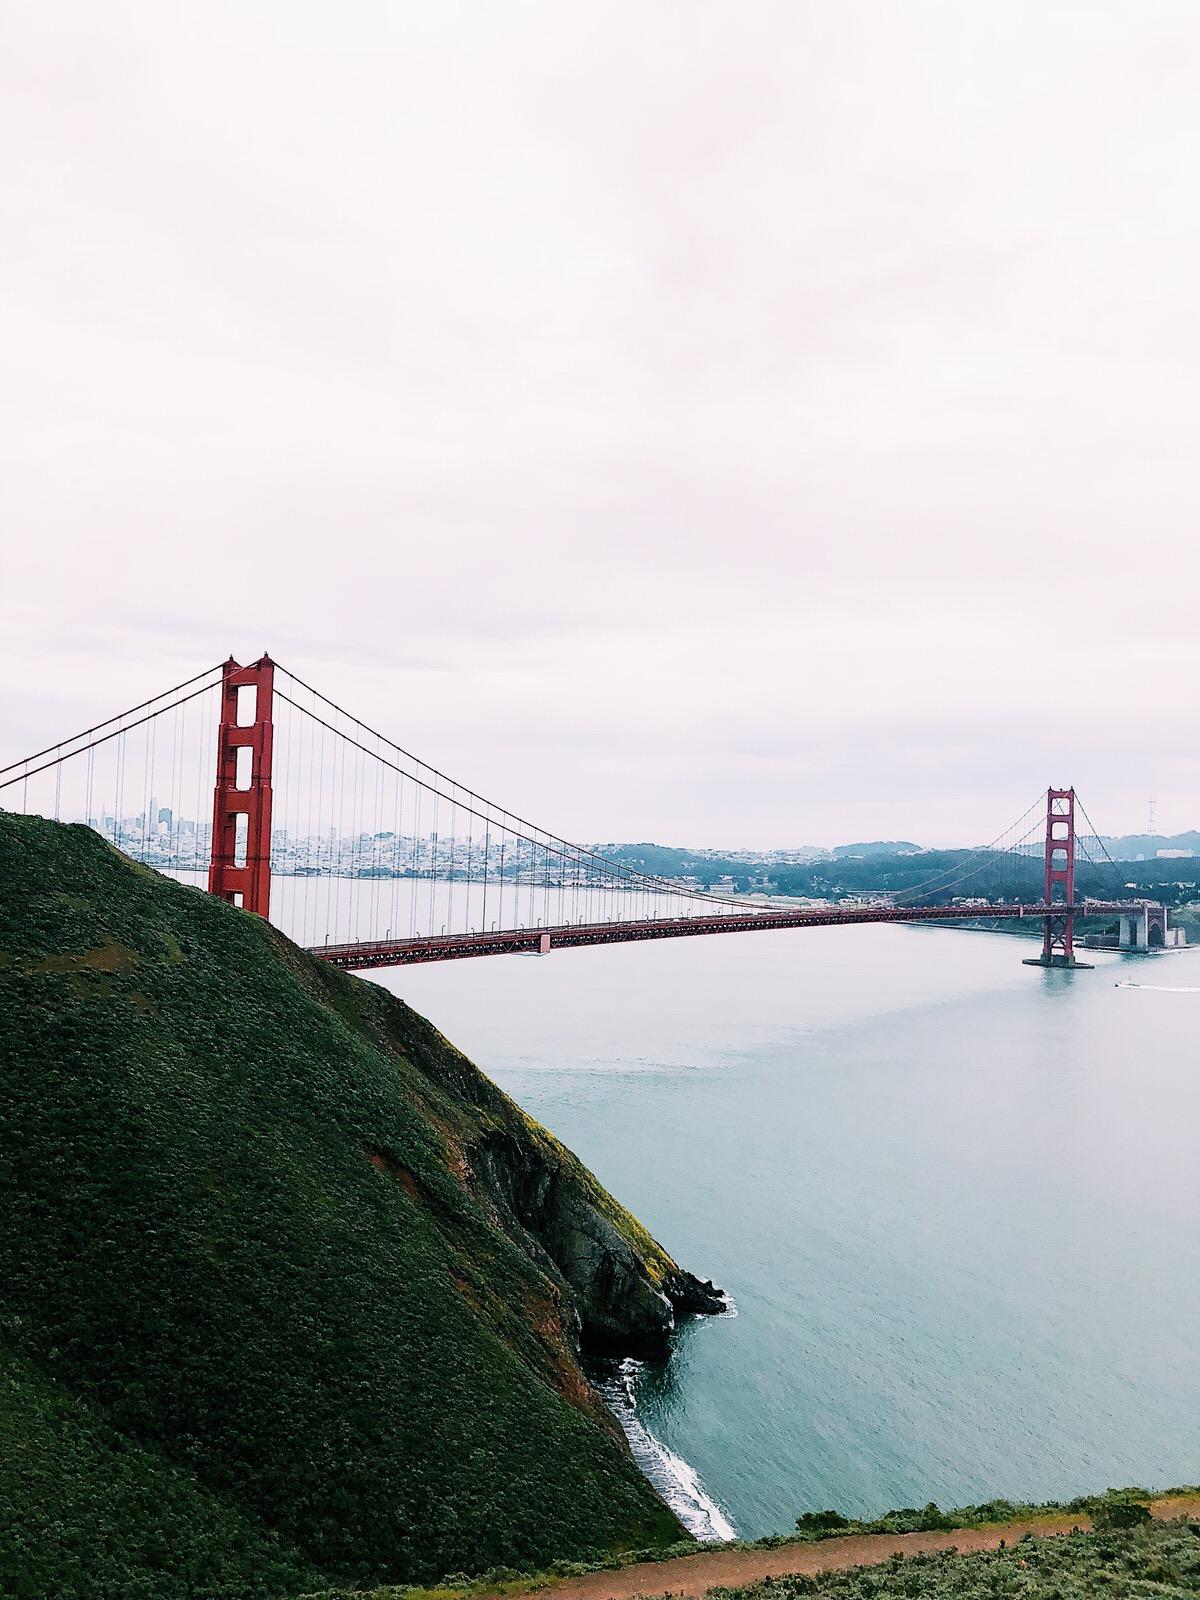 Road Trip, USA, Westküste, Kalifornien, San Francisco, Golden Gate Bridge, Painted Ladies, Cable Cars